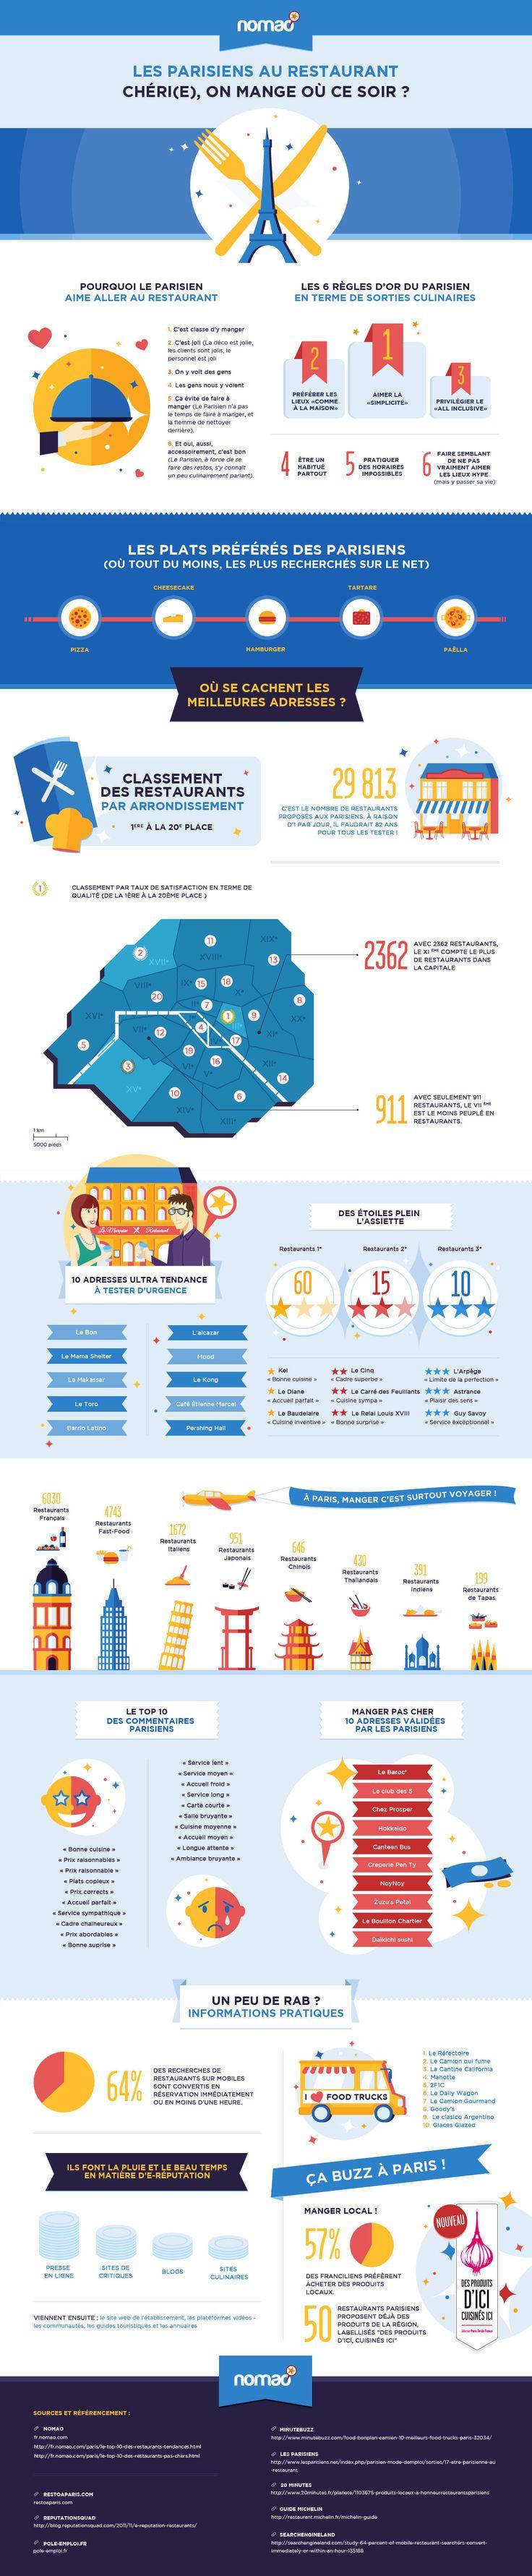 http://static.nomao.com/img/v4/illustration2013/pdf/nomao-infographie-restoparis.pdf